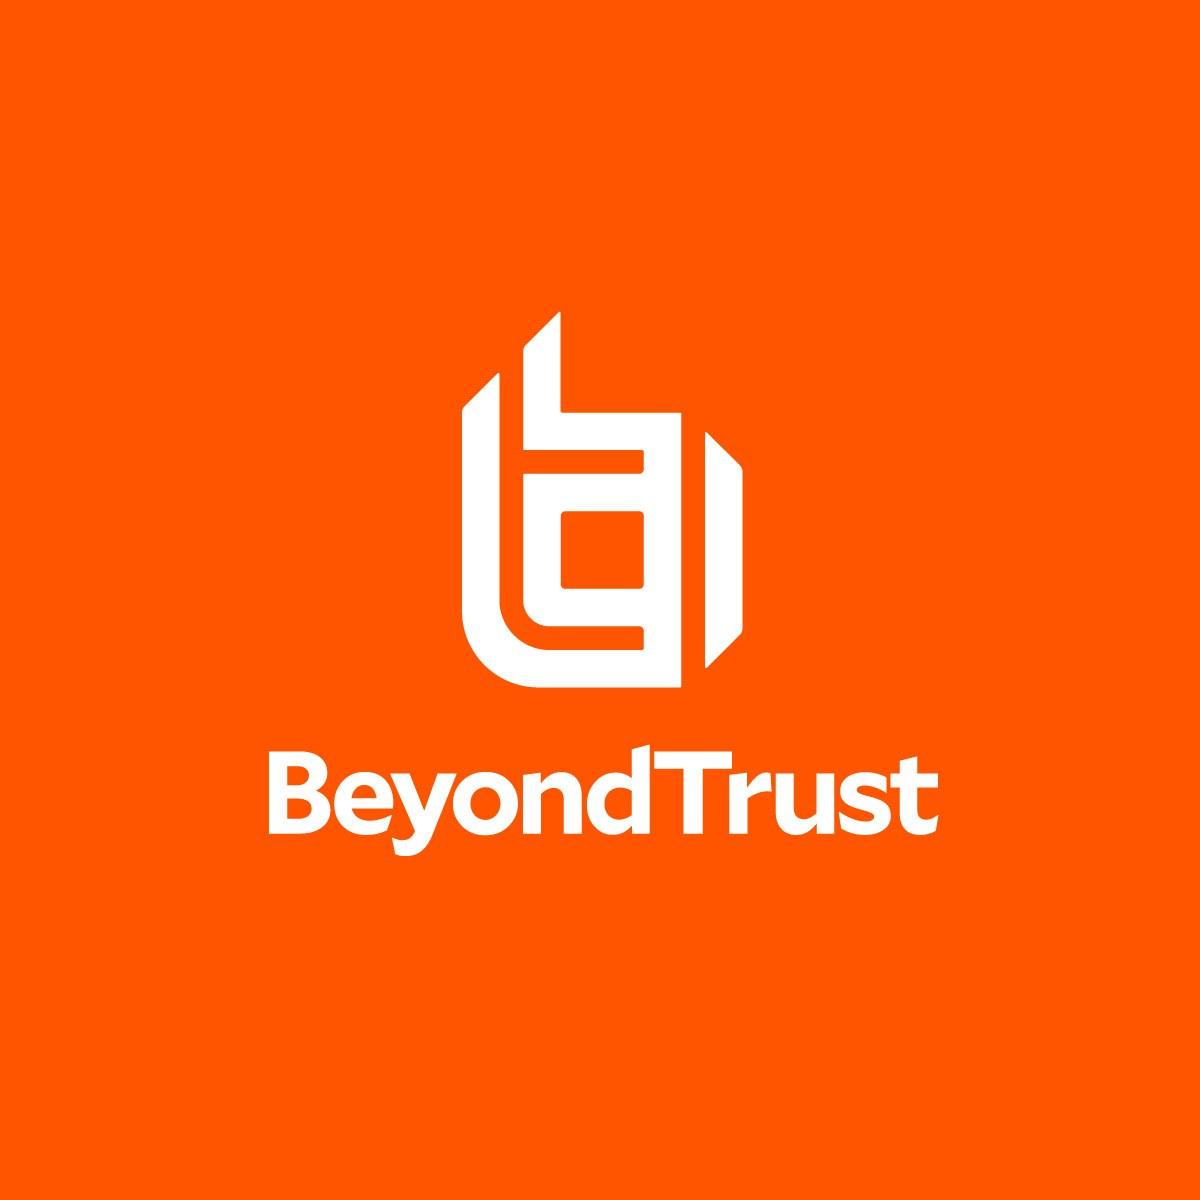 BeyondTrust Company Logo